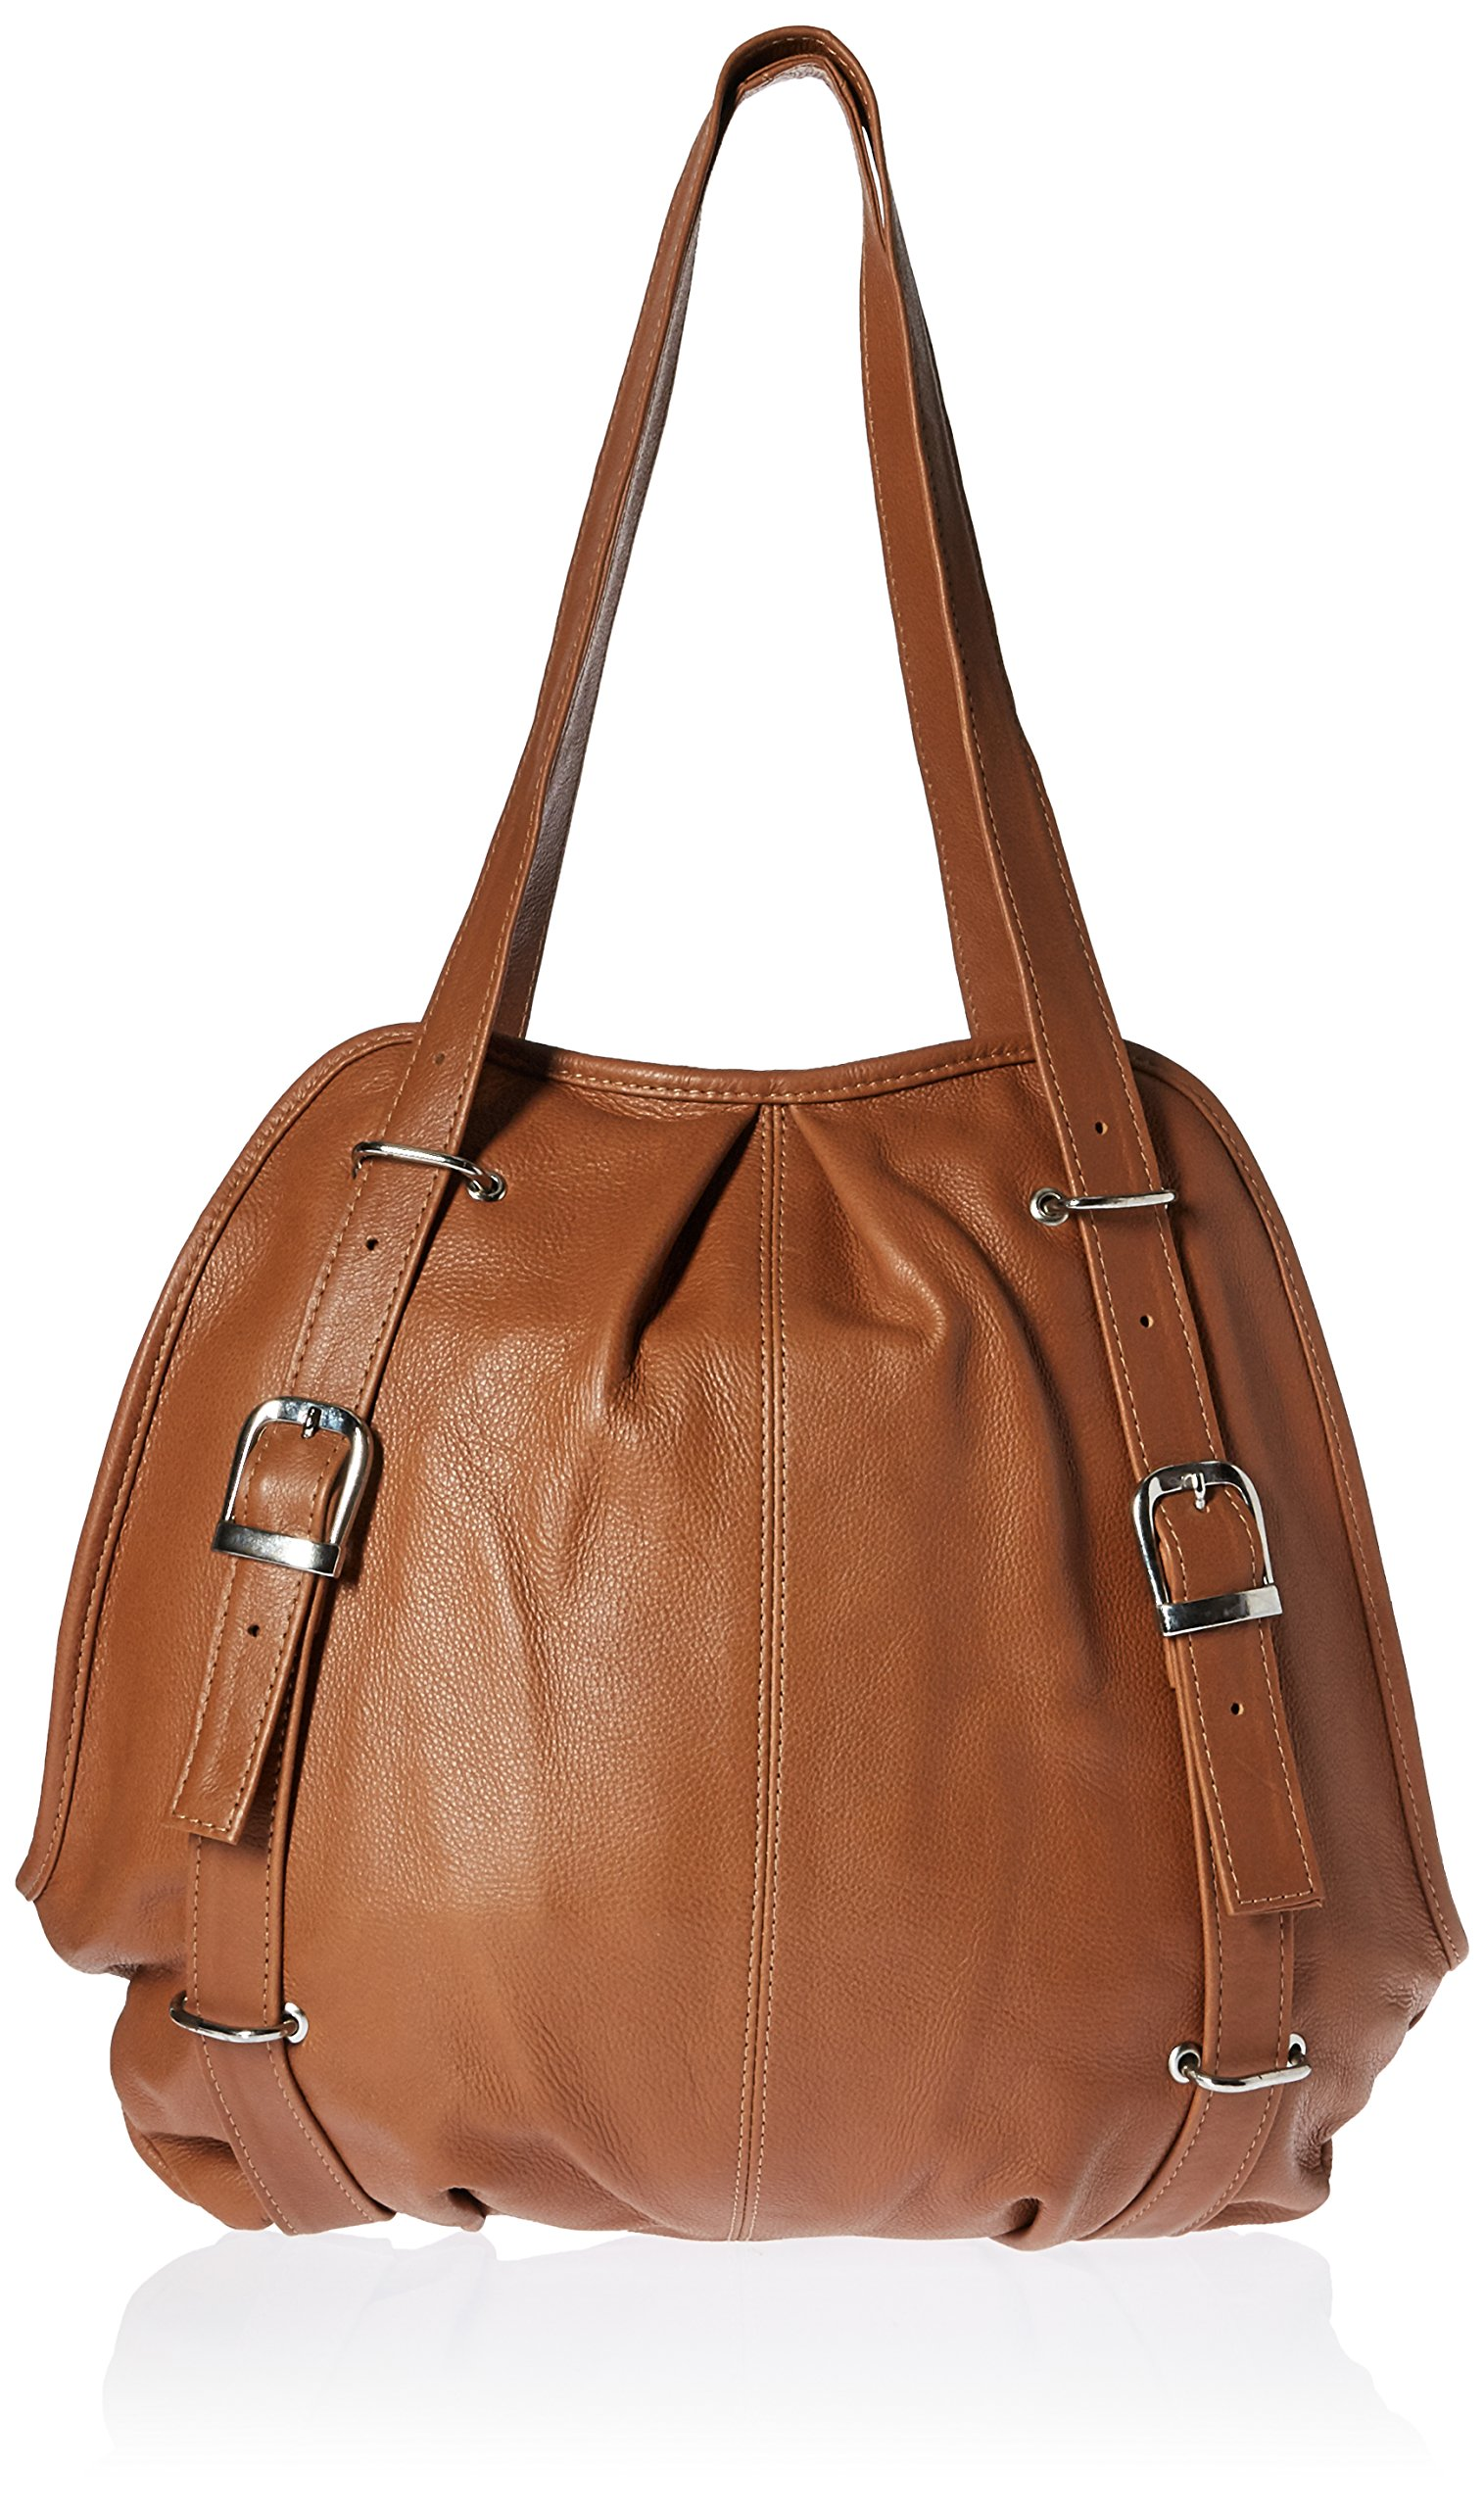 Piel Leather Convertible Buckle Backpack Shoulder Bag, Honey, One Size